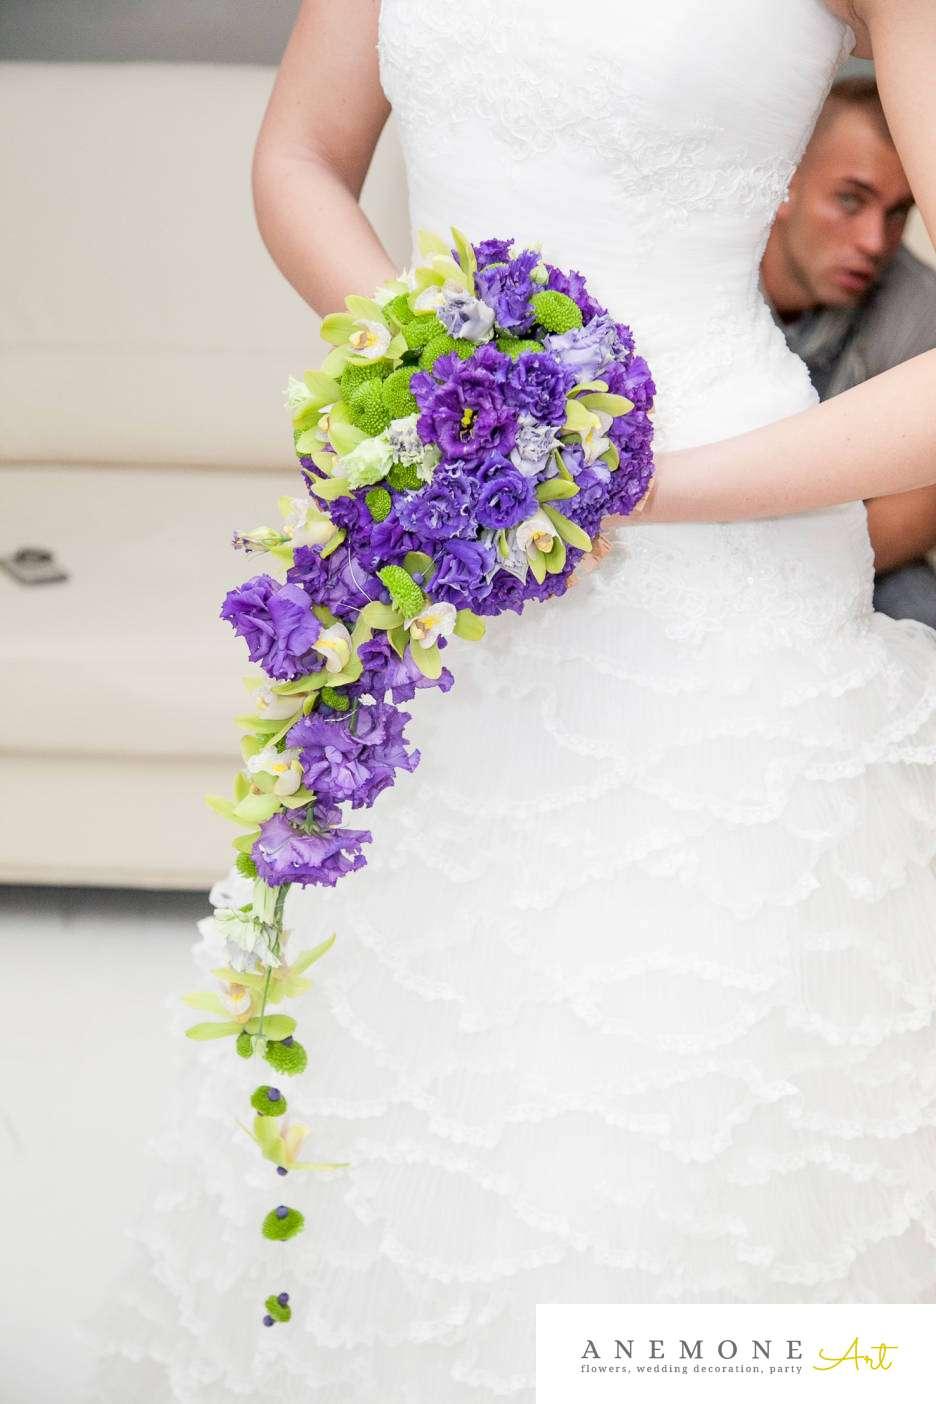 Poza, foto cu Flori de nunta buchet mireasa, curgator, cymbidium, lisianthus, mov, orhidee, santini, verde in Arad, Timisoara, Oradea (wedding flowers, bouquets) nunta Arad, Timisoara, Oradea